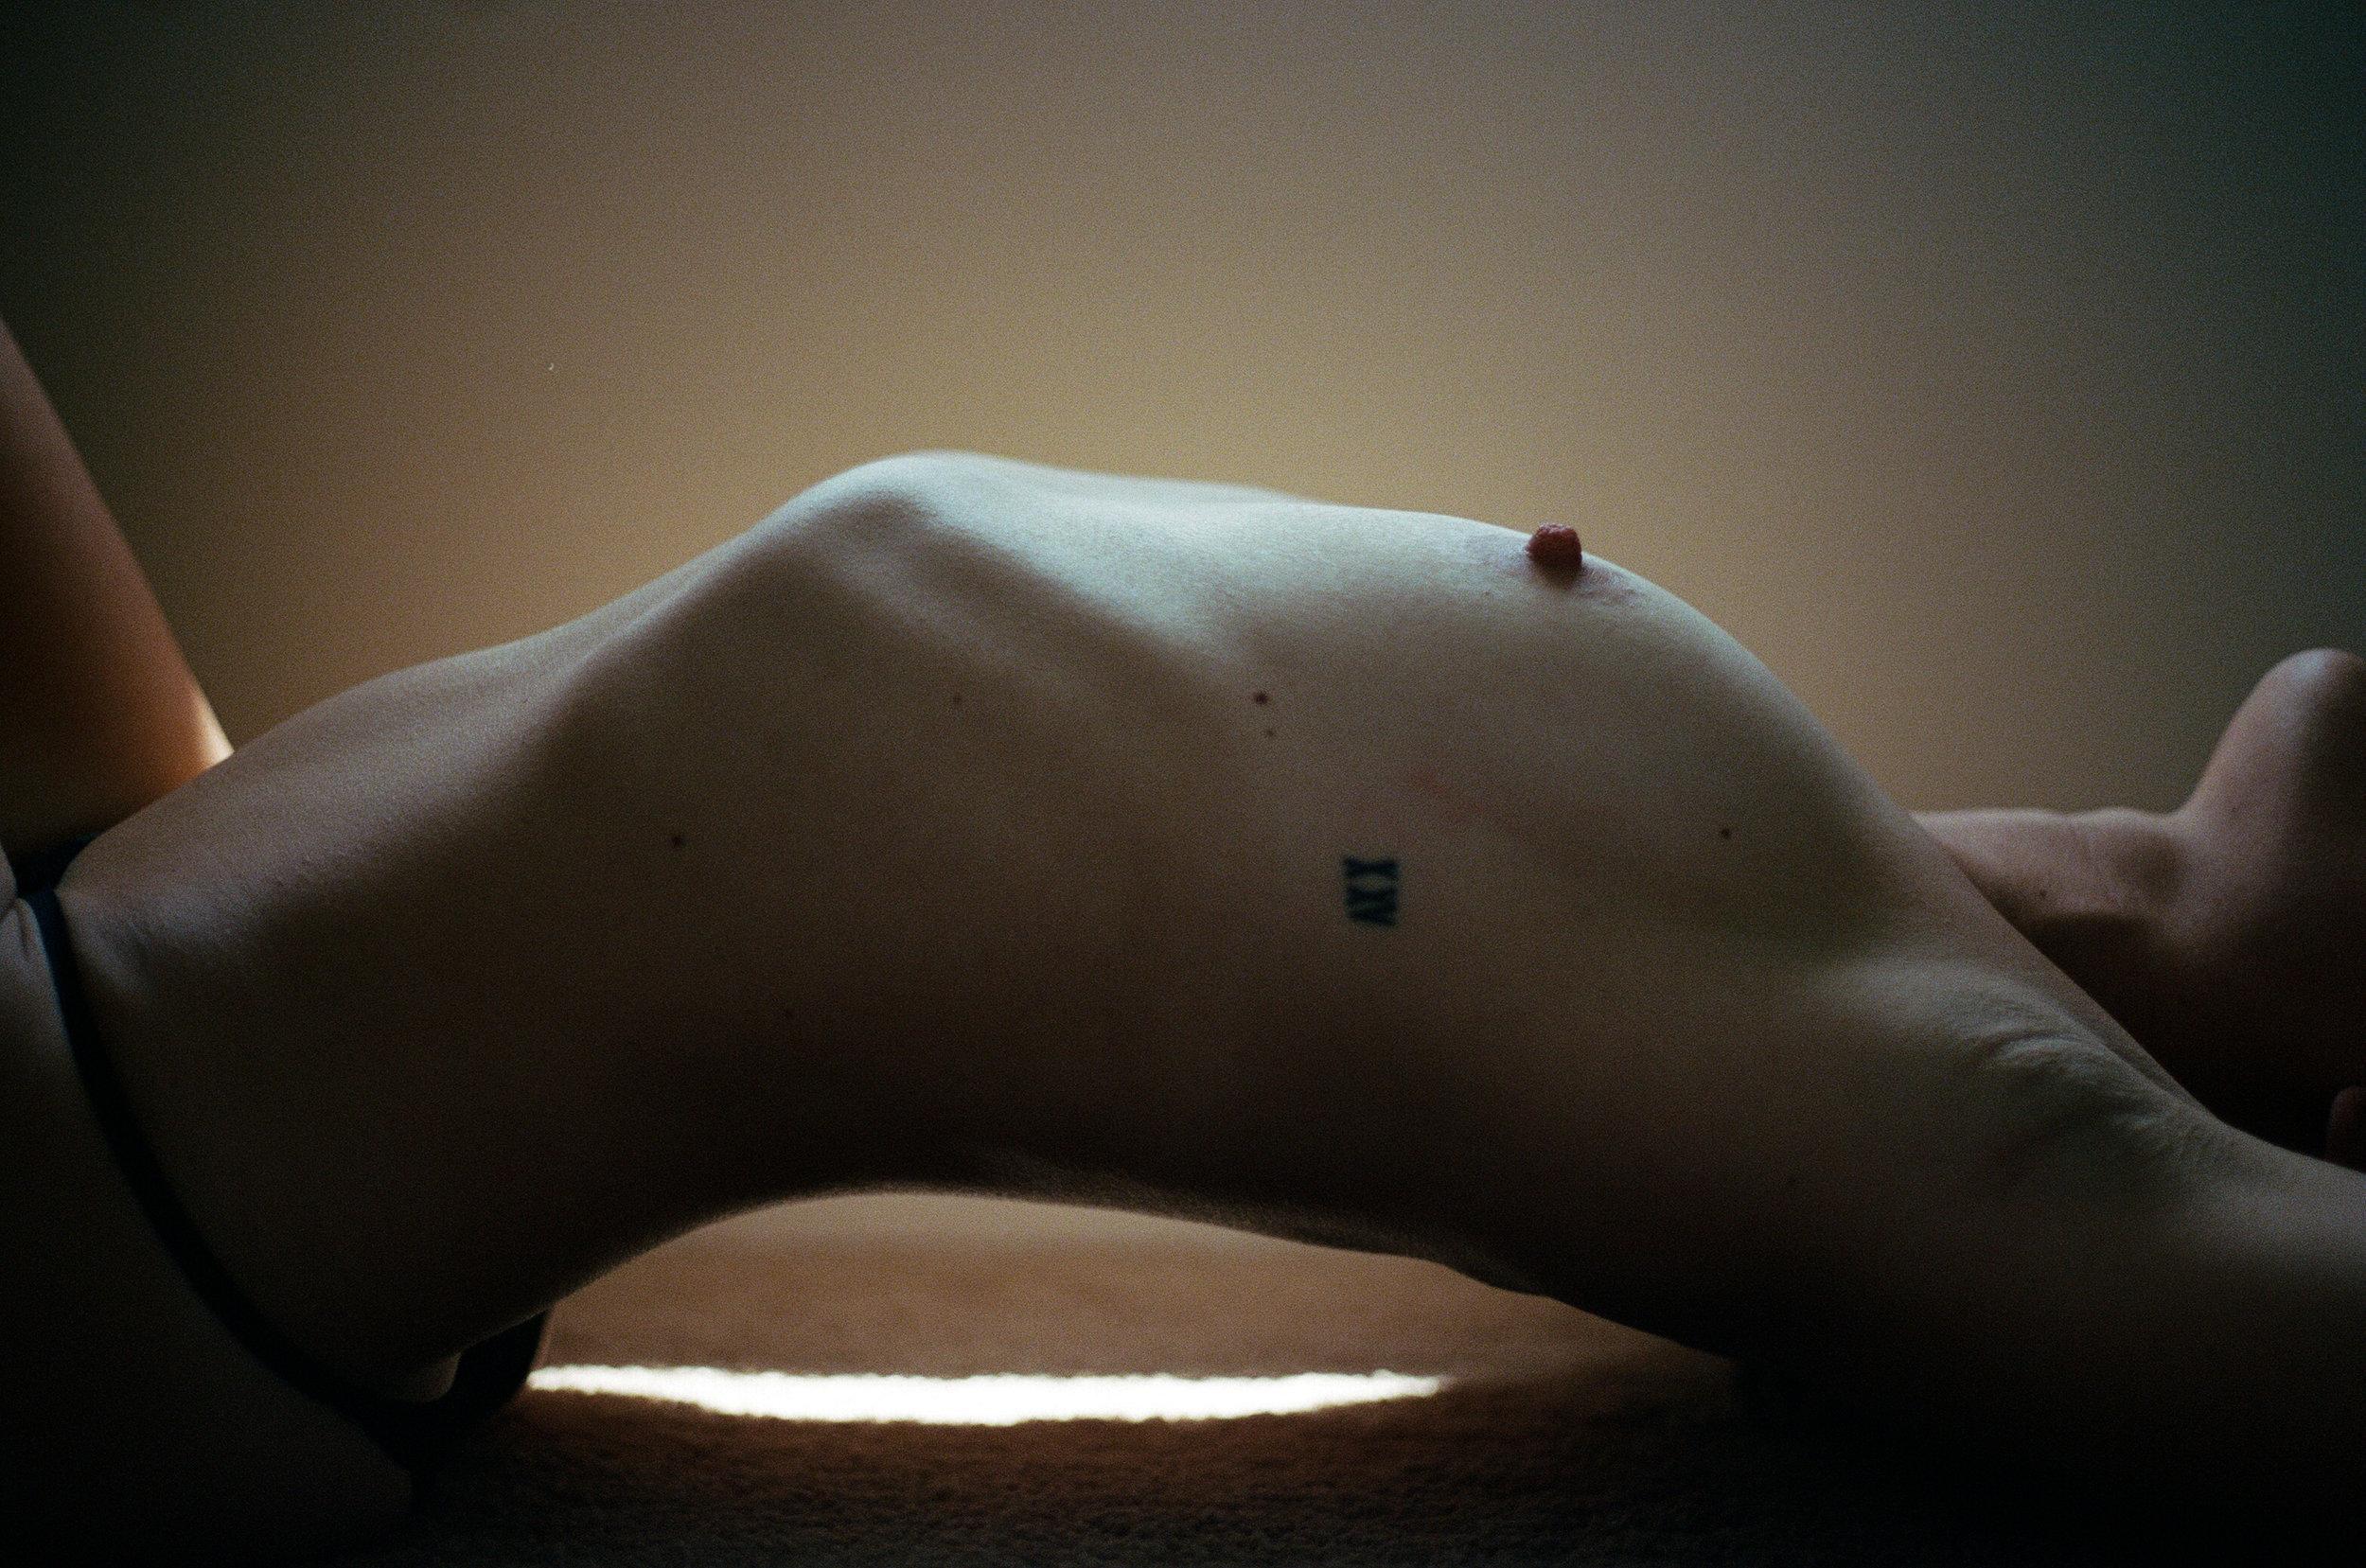 35mm film portrait. artistic nude film photograph. moody film. moody boudoir. canon ae-1. moody portrait. emotional portrait. ohio portrait photographer. sarah rose photography. i am sarah rose.